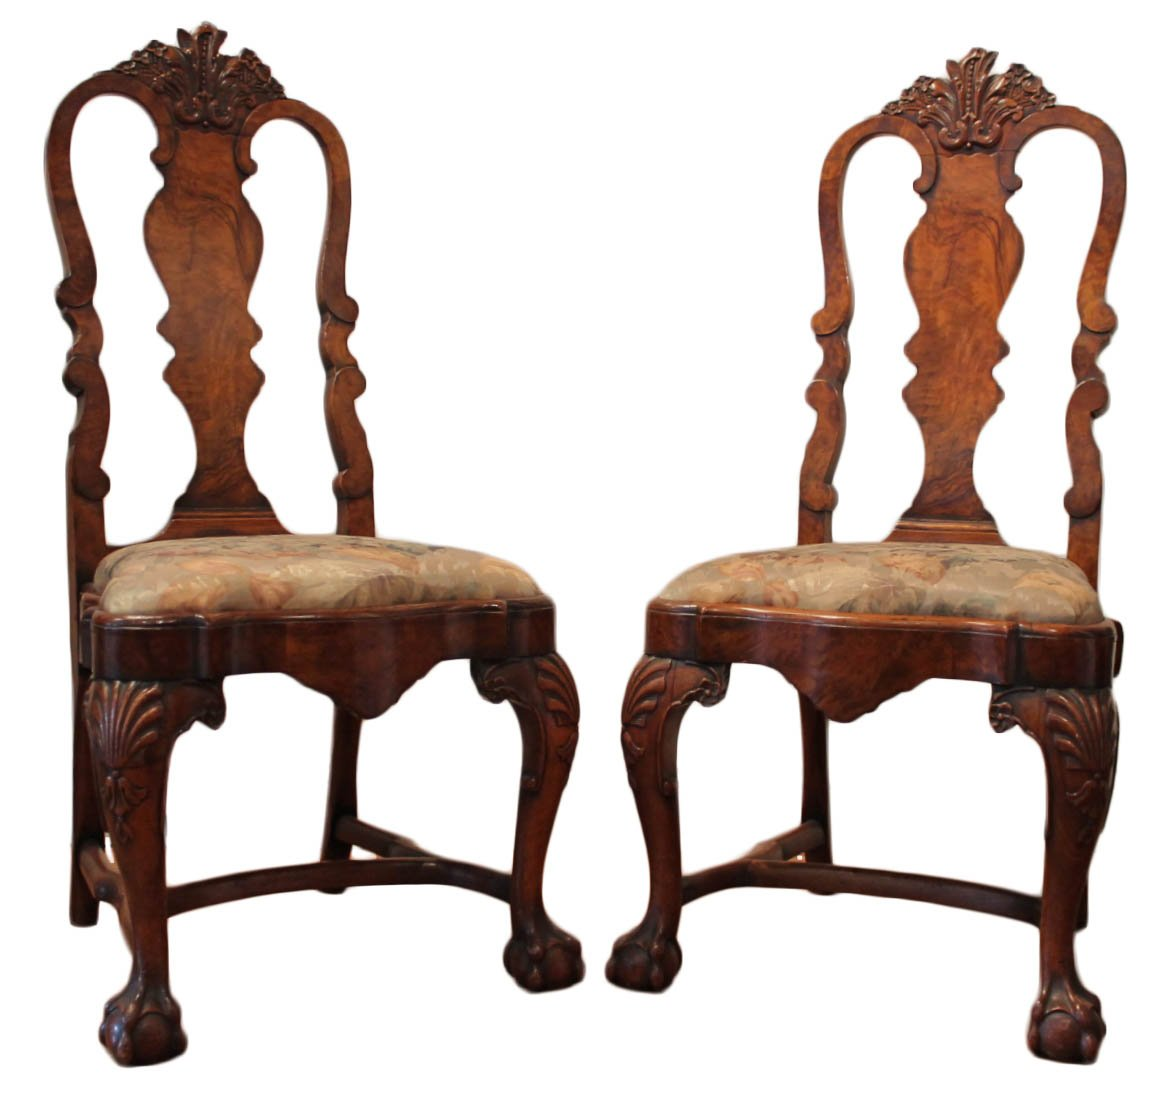 Portuguese Burl Walnut Colonial Rococo Style Side Chairs